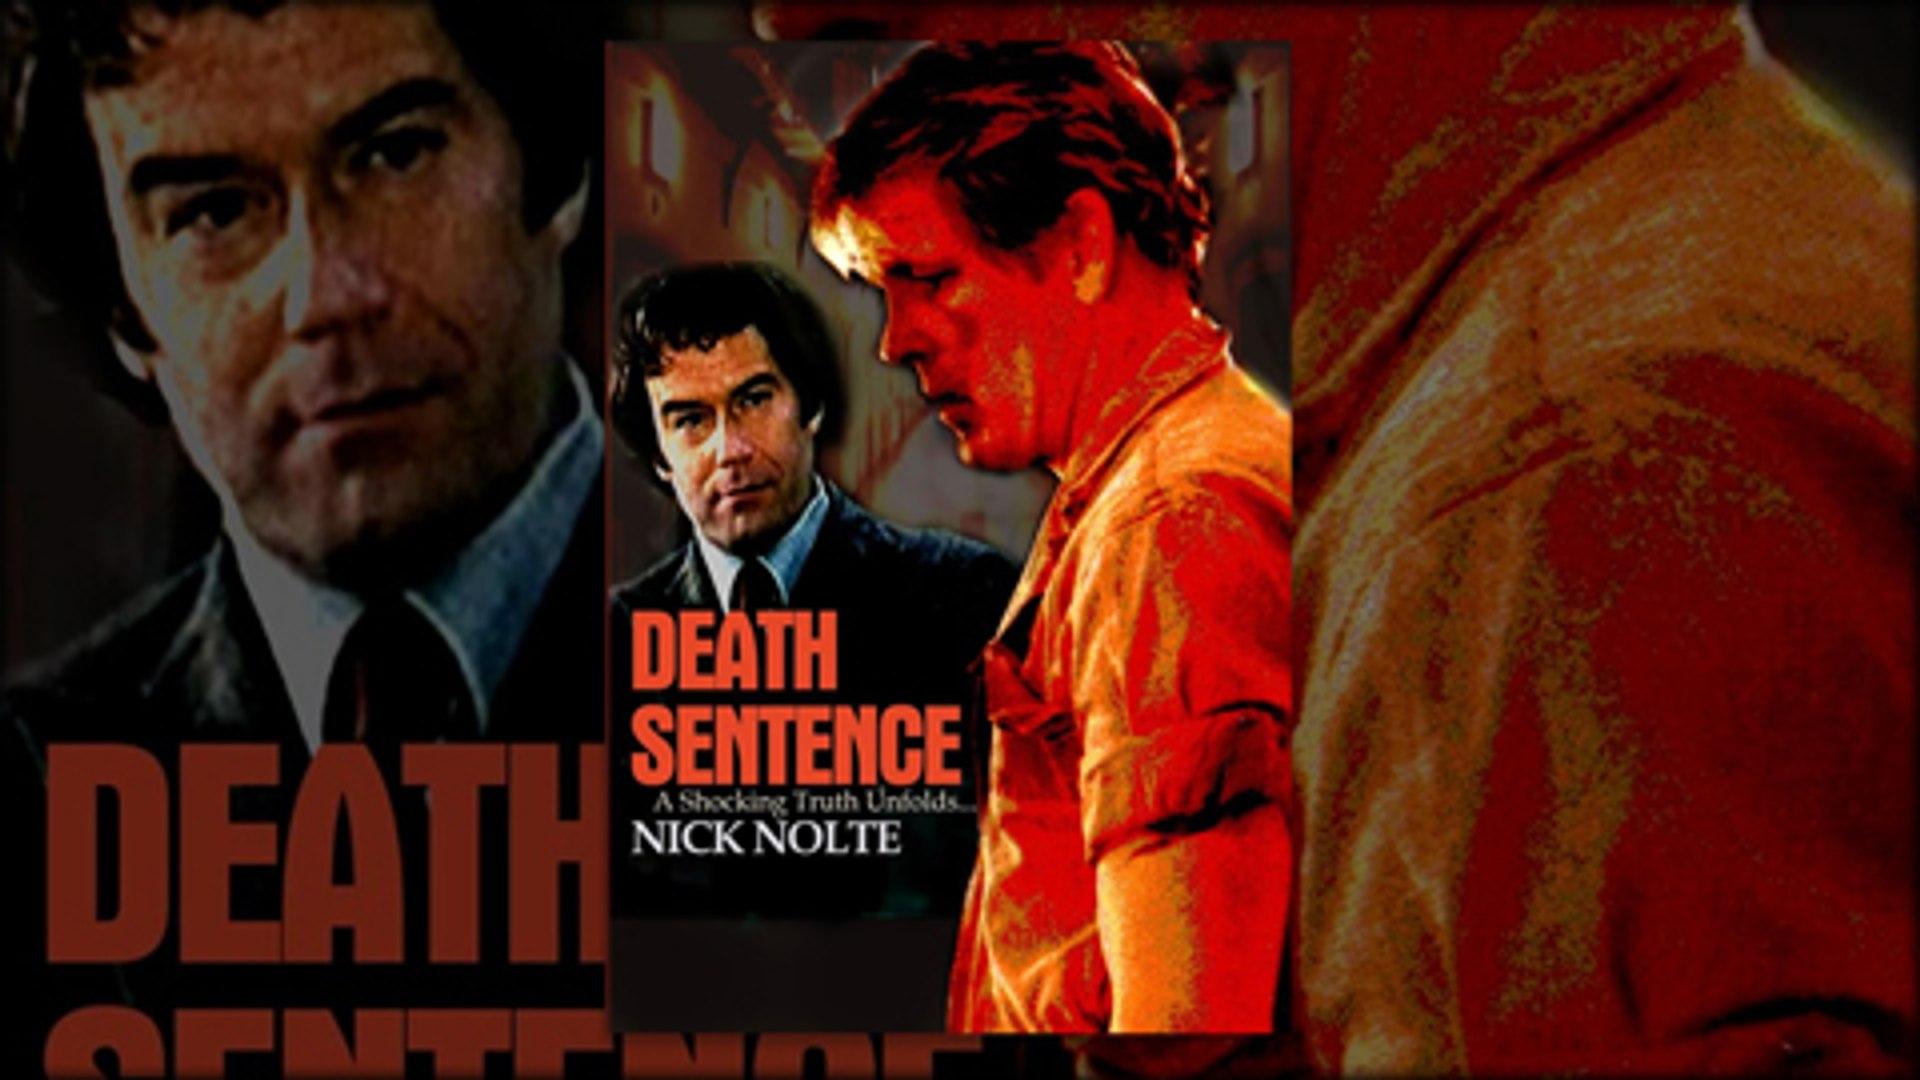 Death Sentence (1974) - Nick Nolte, Cloris Leachman, Laurence Luckinbill -  Feature (Crime, Mystery, Thriller)